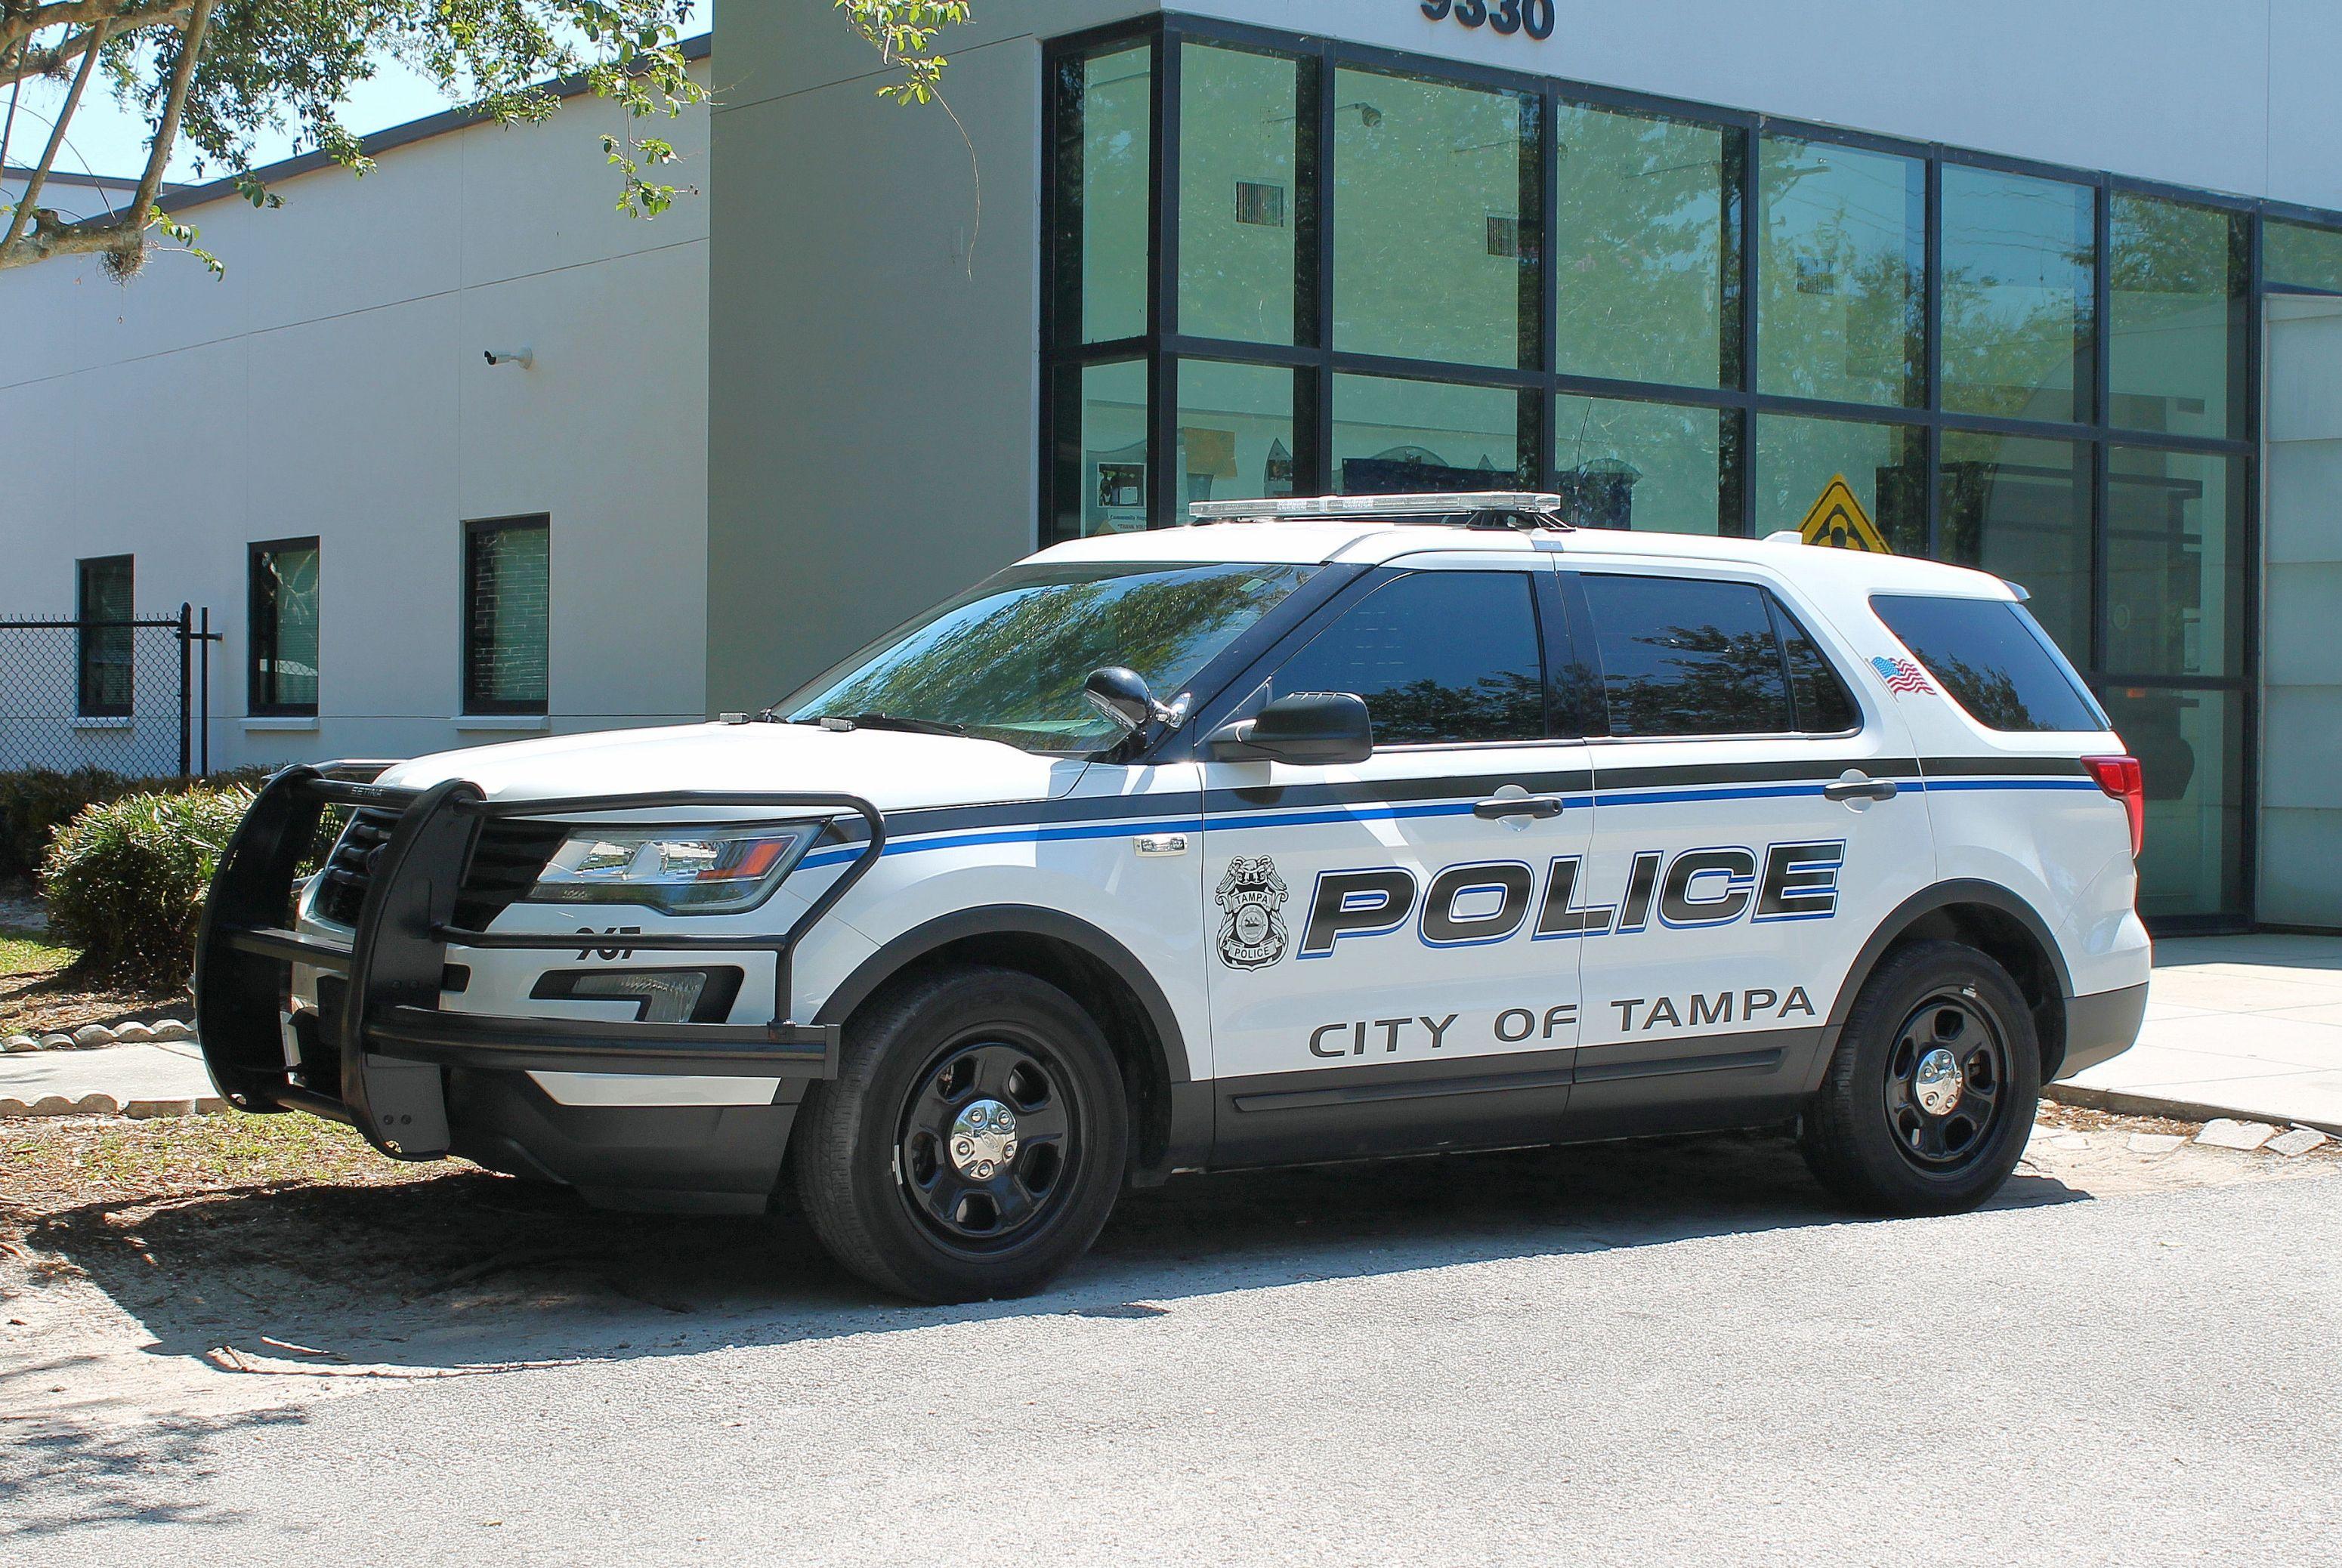 Tampa Florida Tampa Police Department Ford Utility Interceptor Vehicle Florida Police Department Tampa